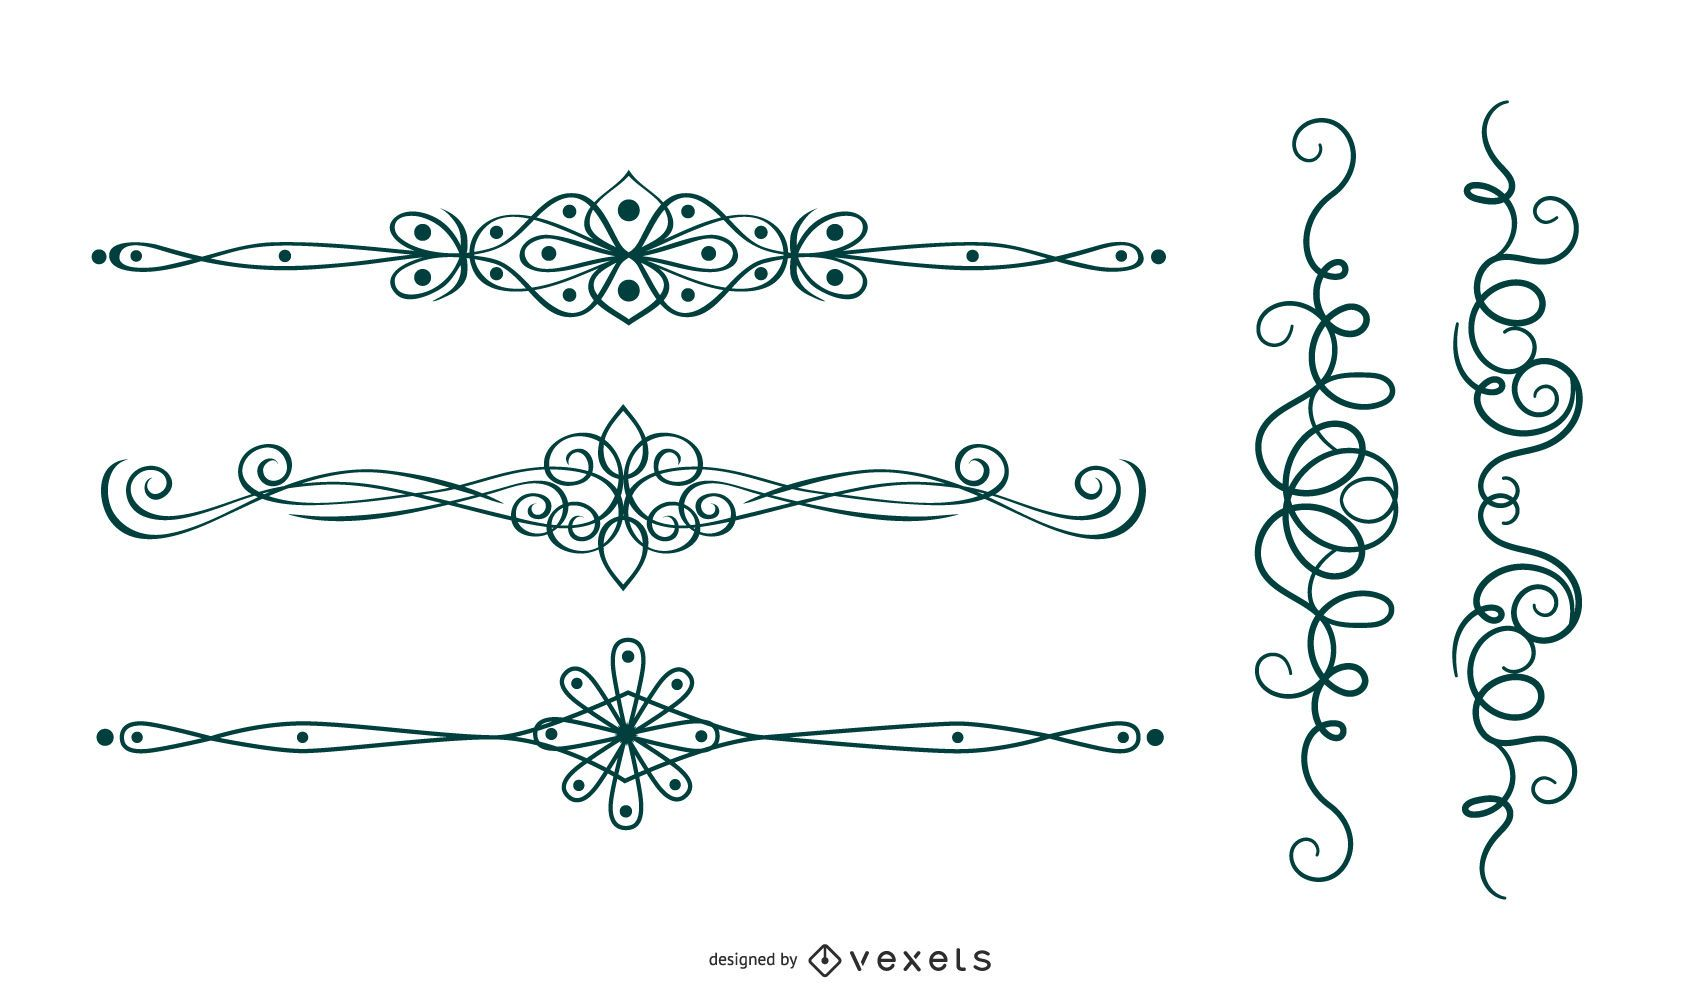 Curly Ornaments Design